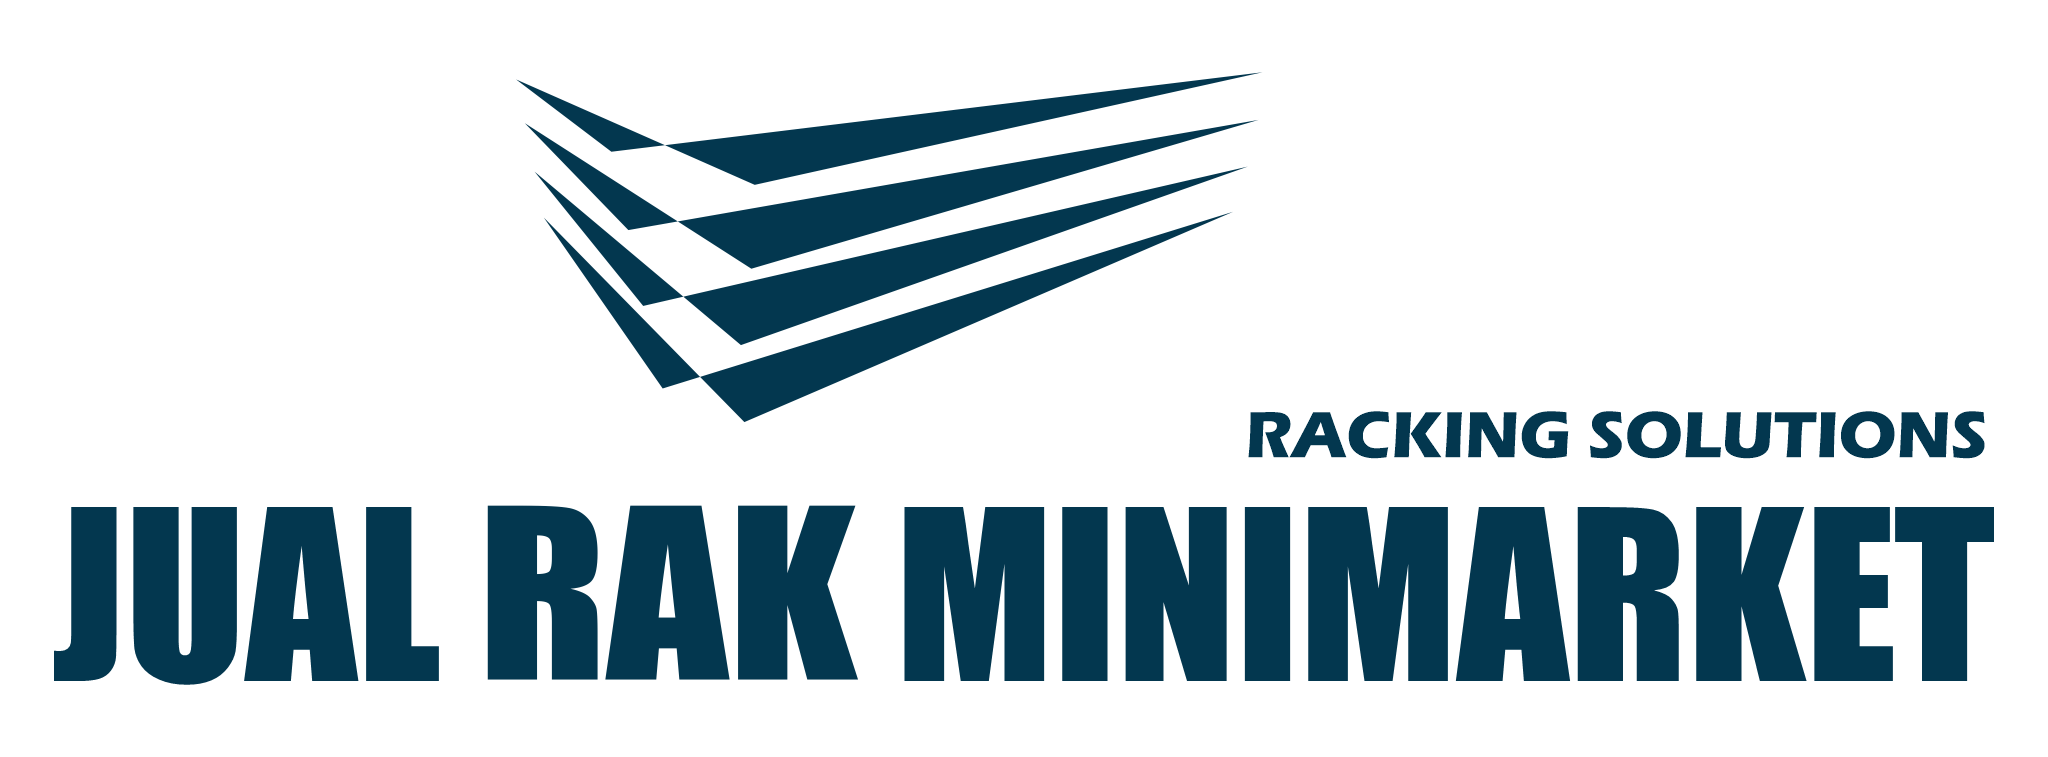 Jual Rak Minimarket